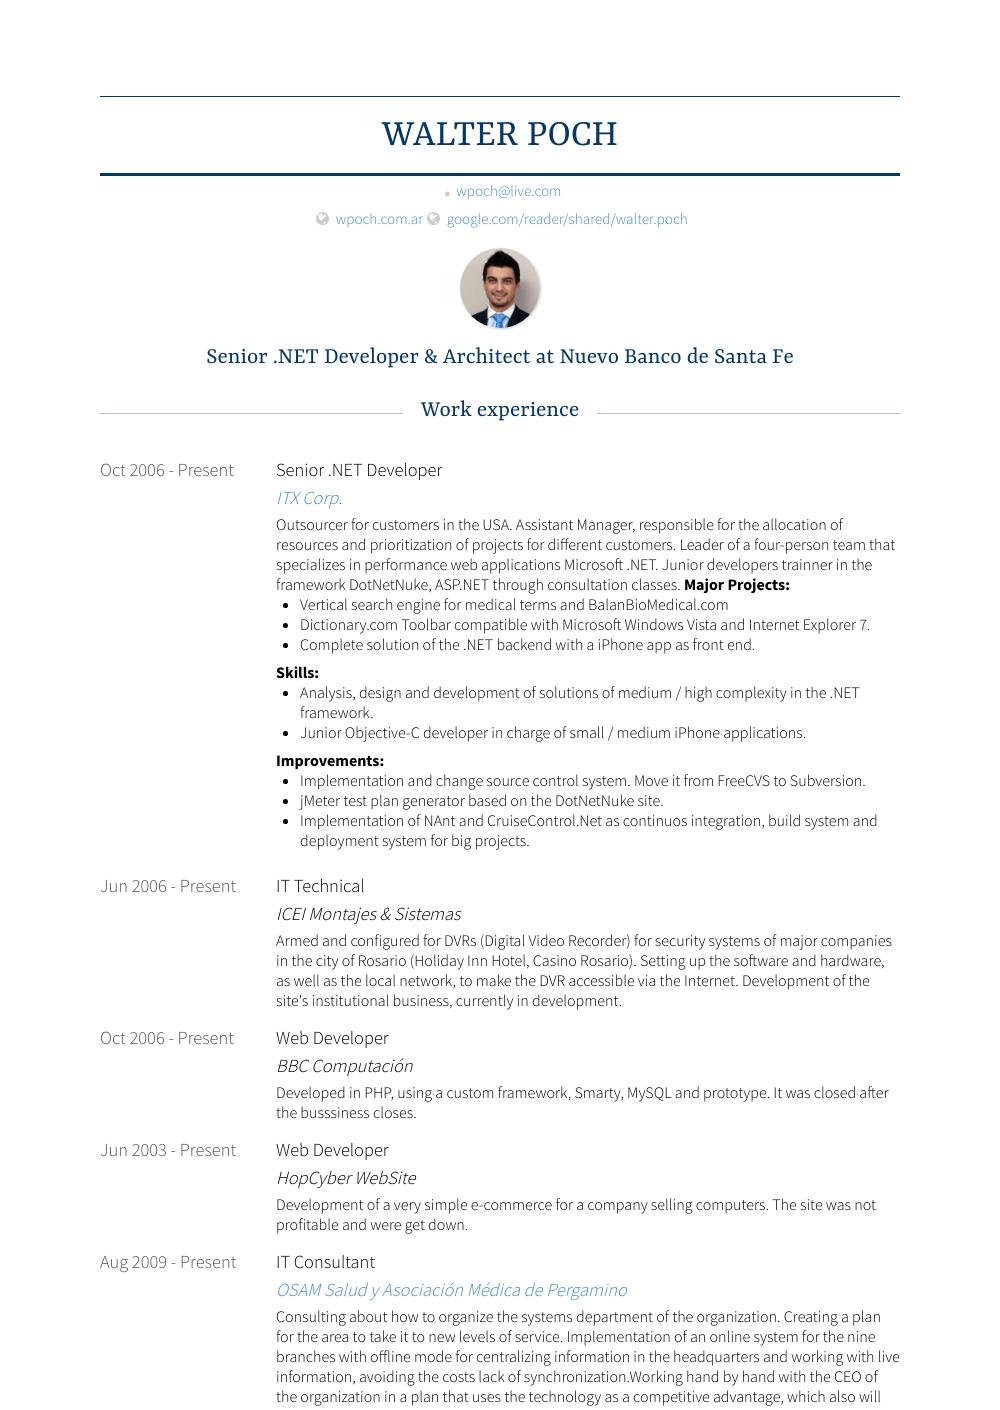 Pin On Top New Resume Ideas Printable